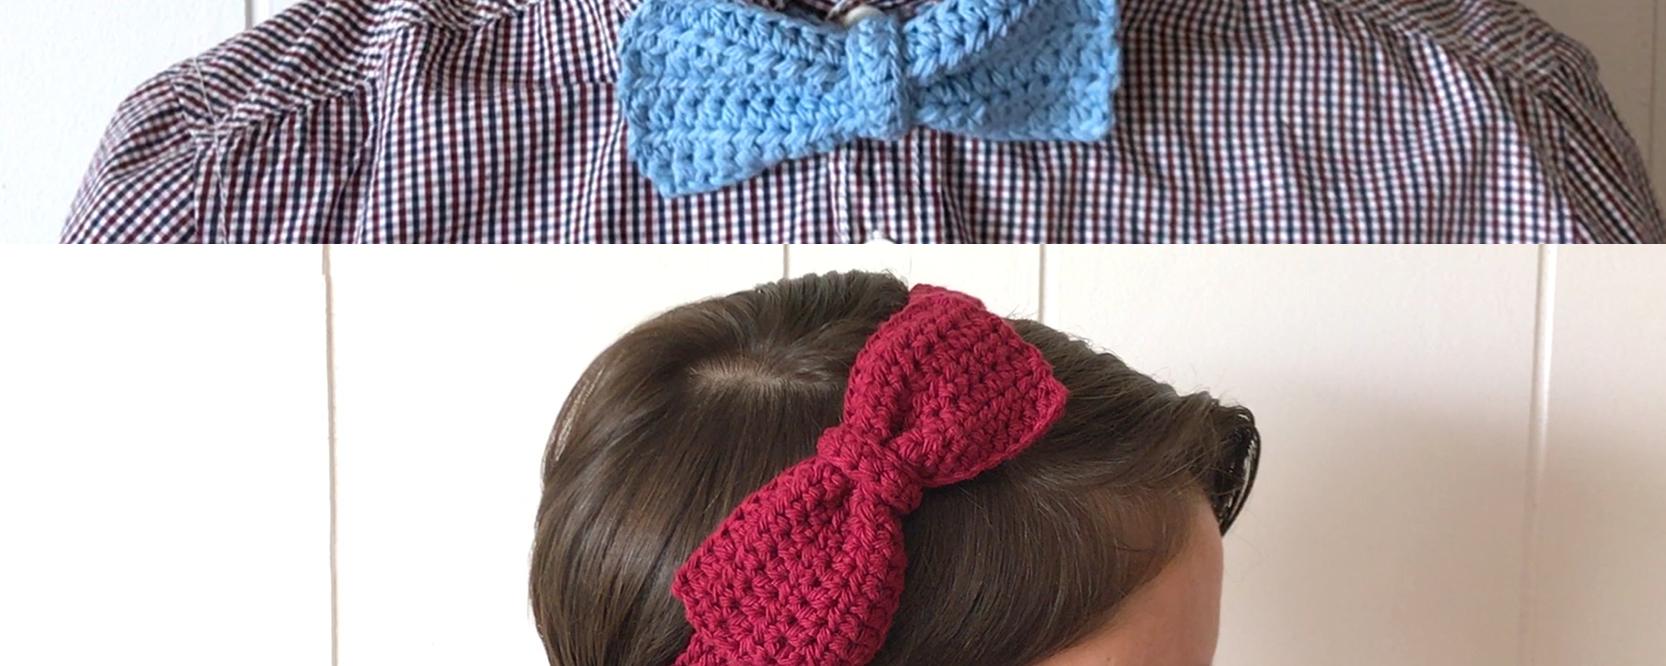 Bowtie or Headband